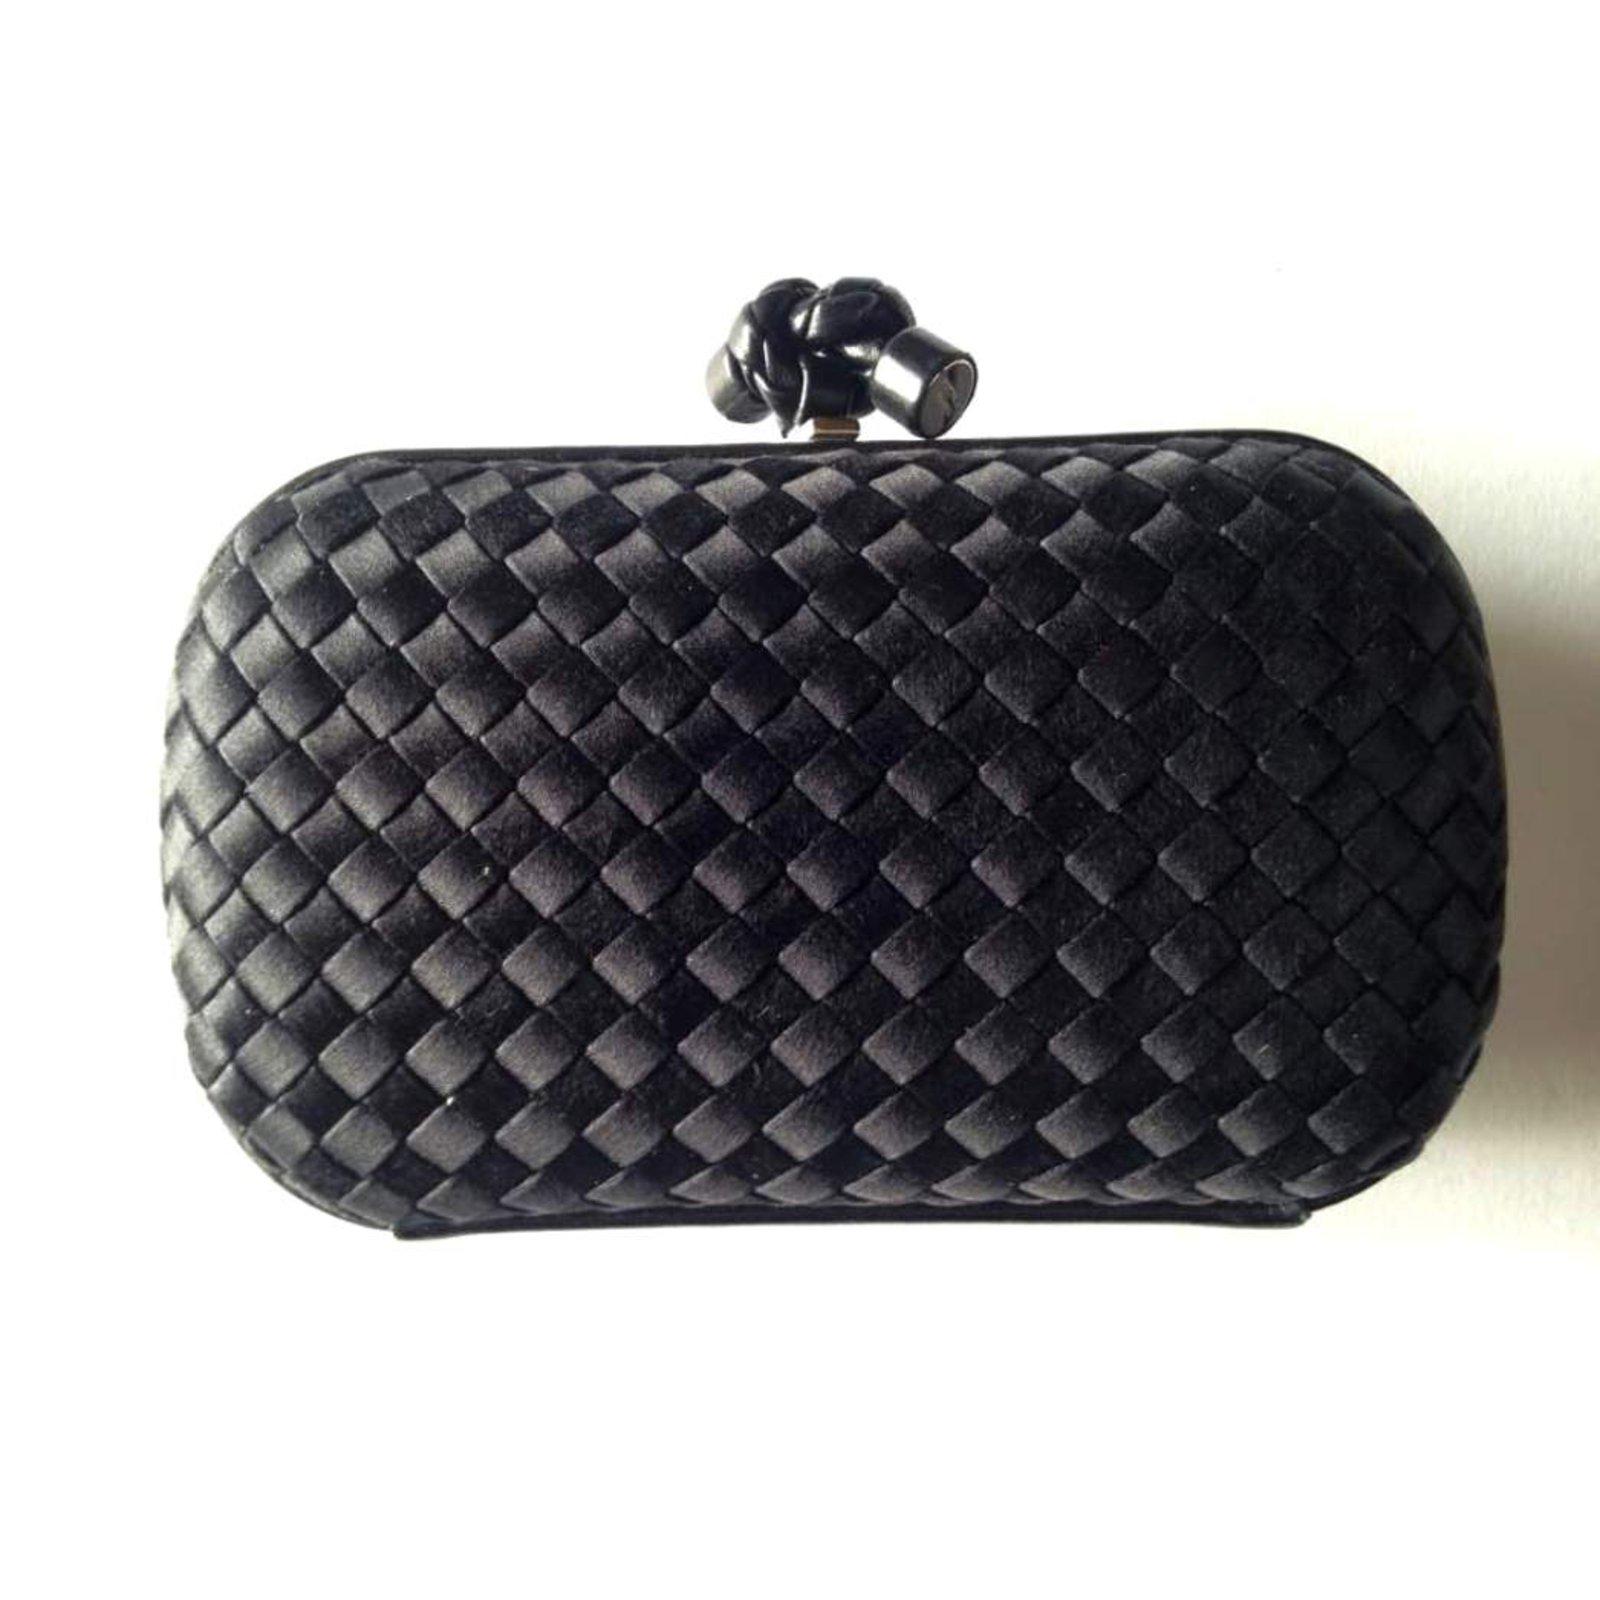 0d2cf1db63 Bottega Veneta knot Clutch bags Leather